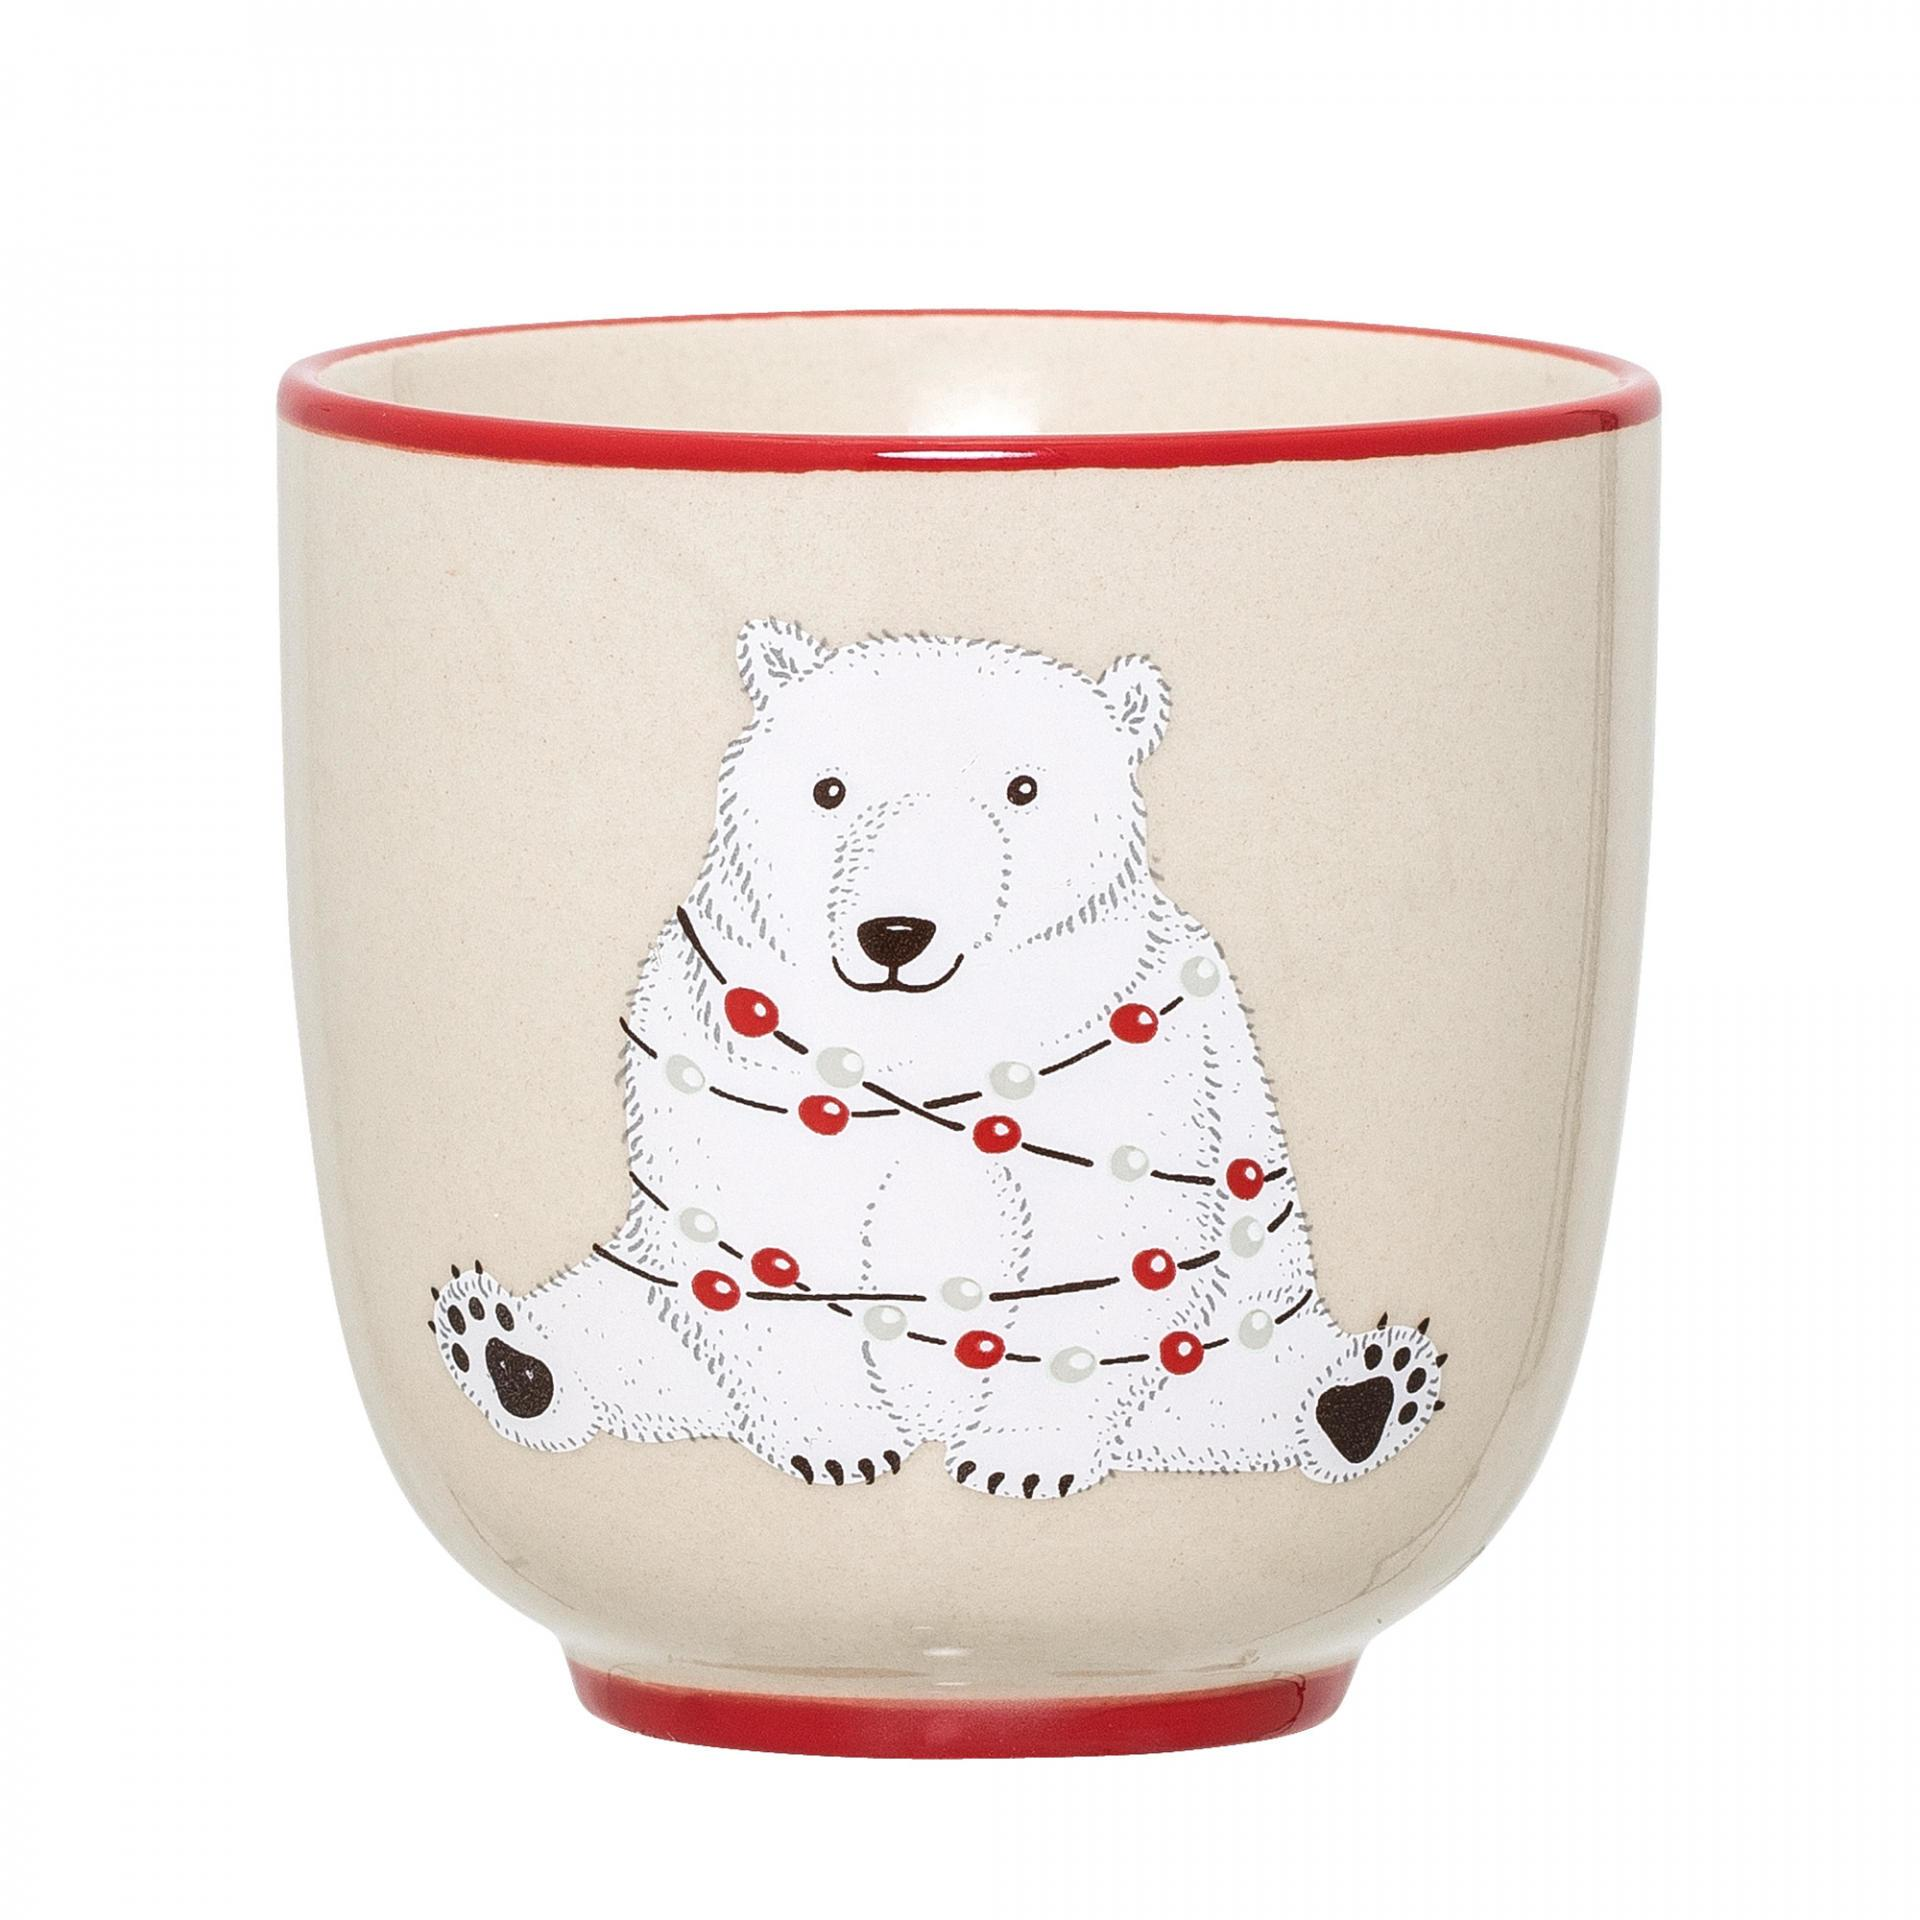 Bloomingville Keramický hrneček bez ouška Twinkle, červená barva, krémová barva, keramika